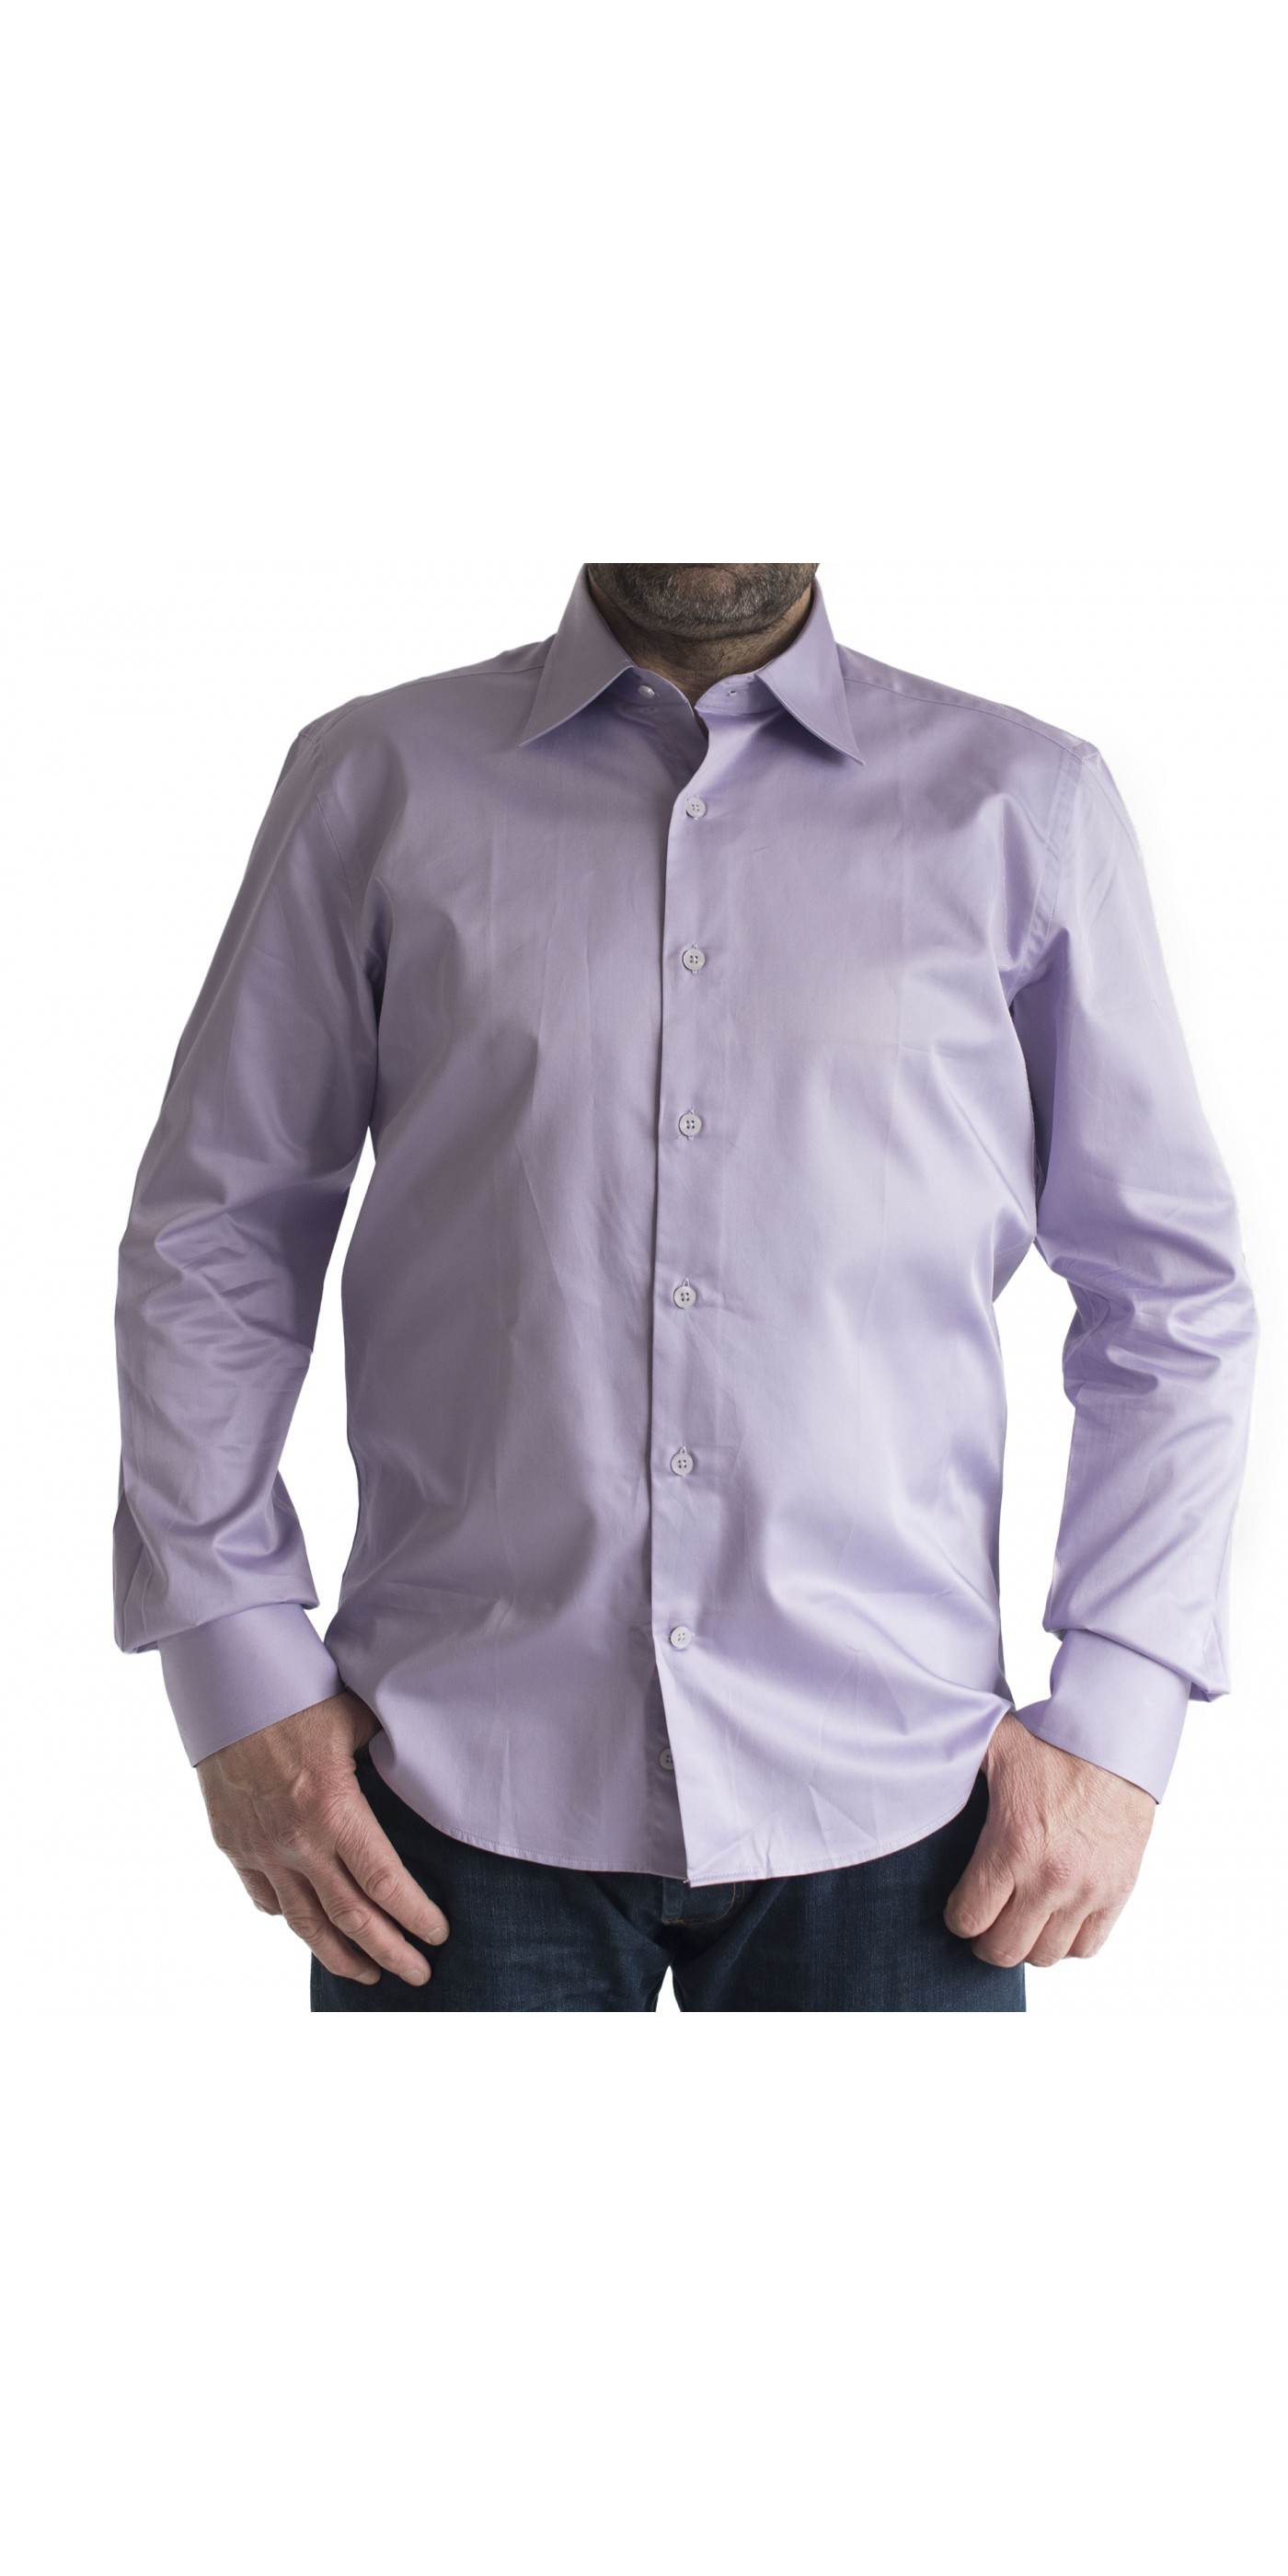 cb24d059af29 Ανδρικό σπόρ πουκάμισο slim fit μονοχρωμο μωβ-λεβαντα. Loading zoom